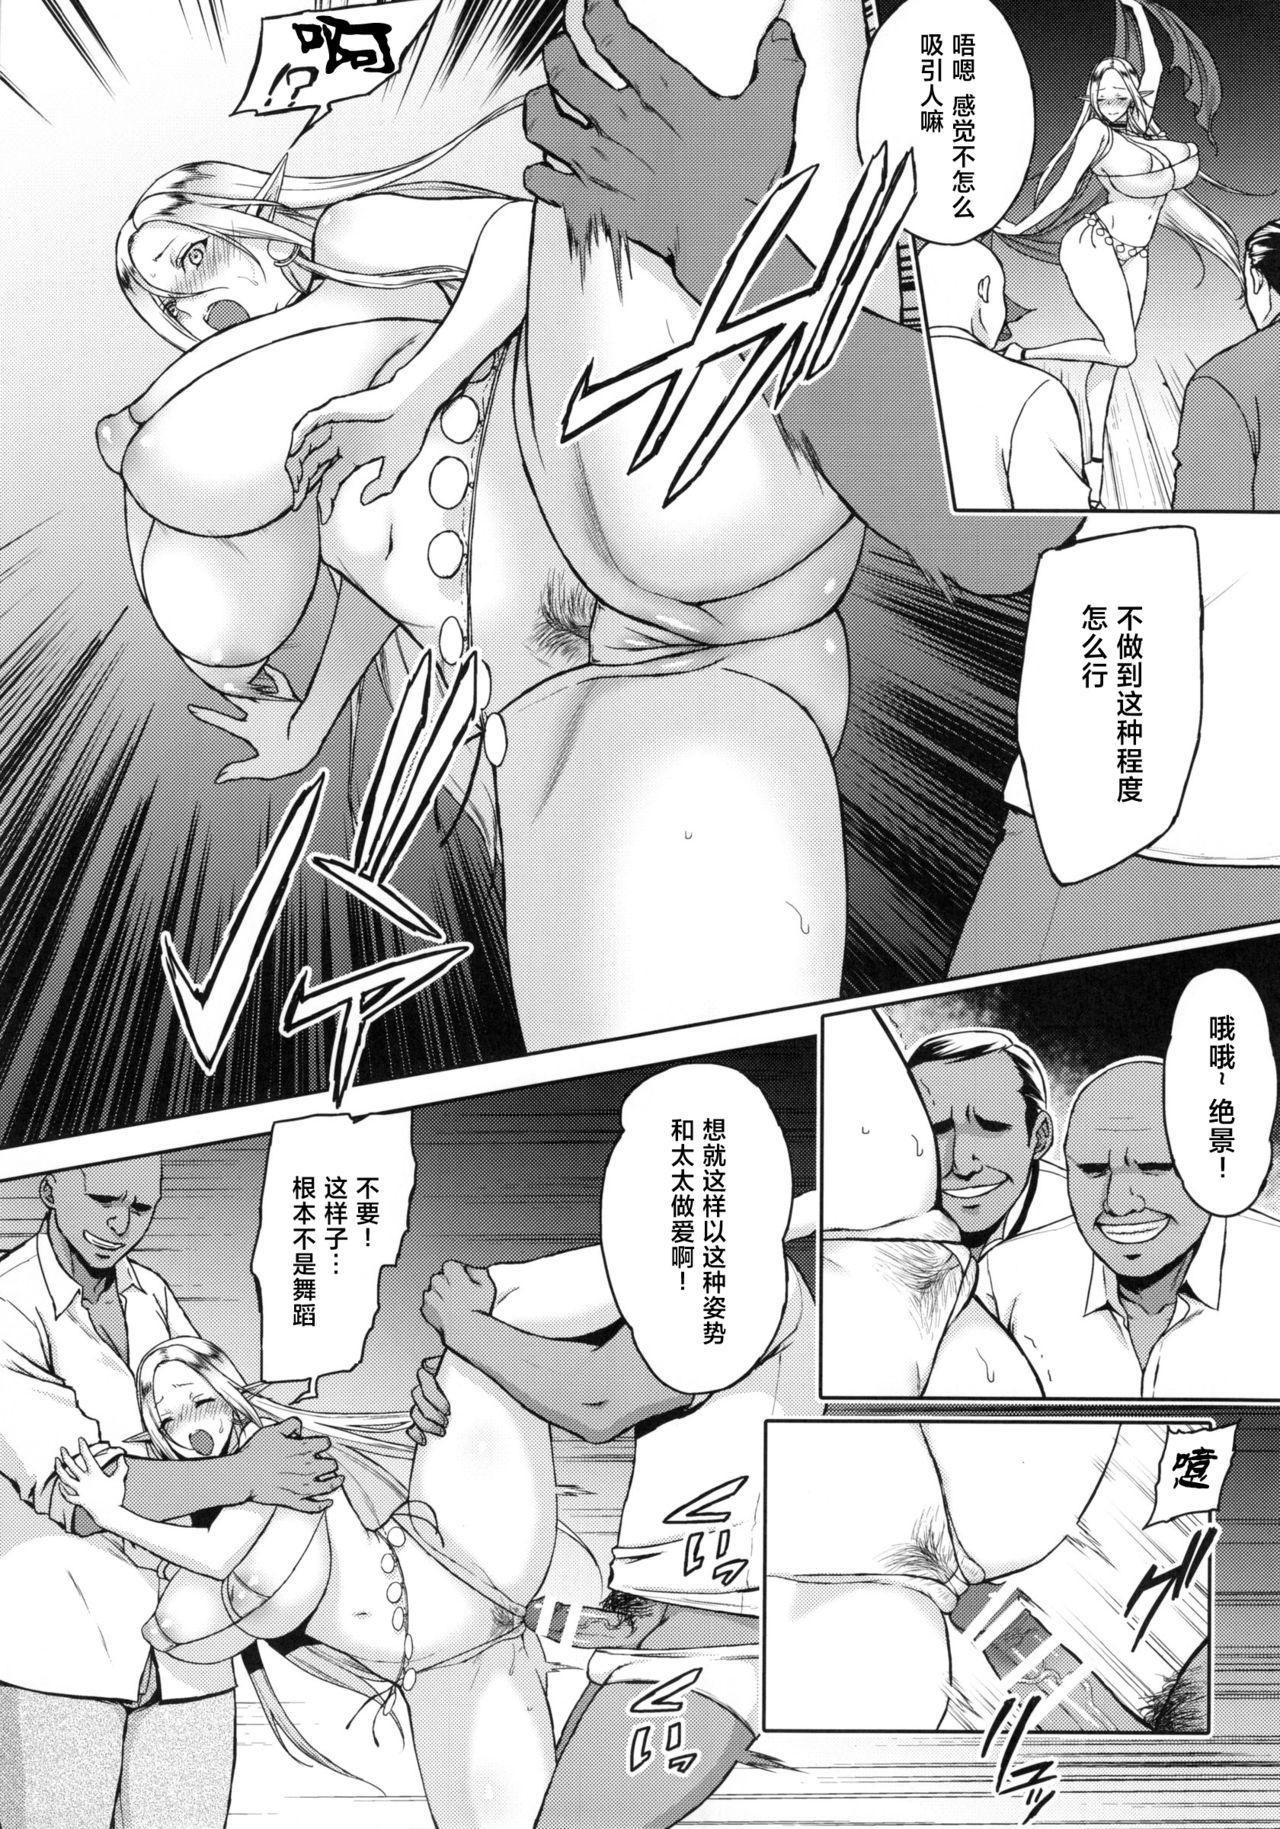 Kaika - Ochita Elf Tsuma 17